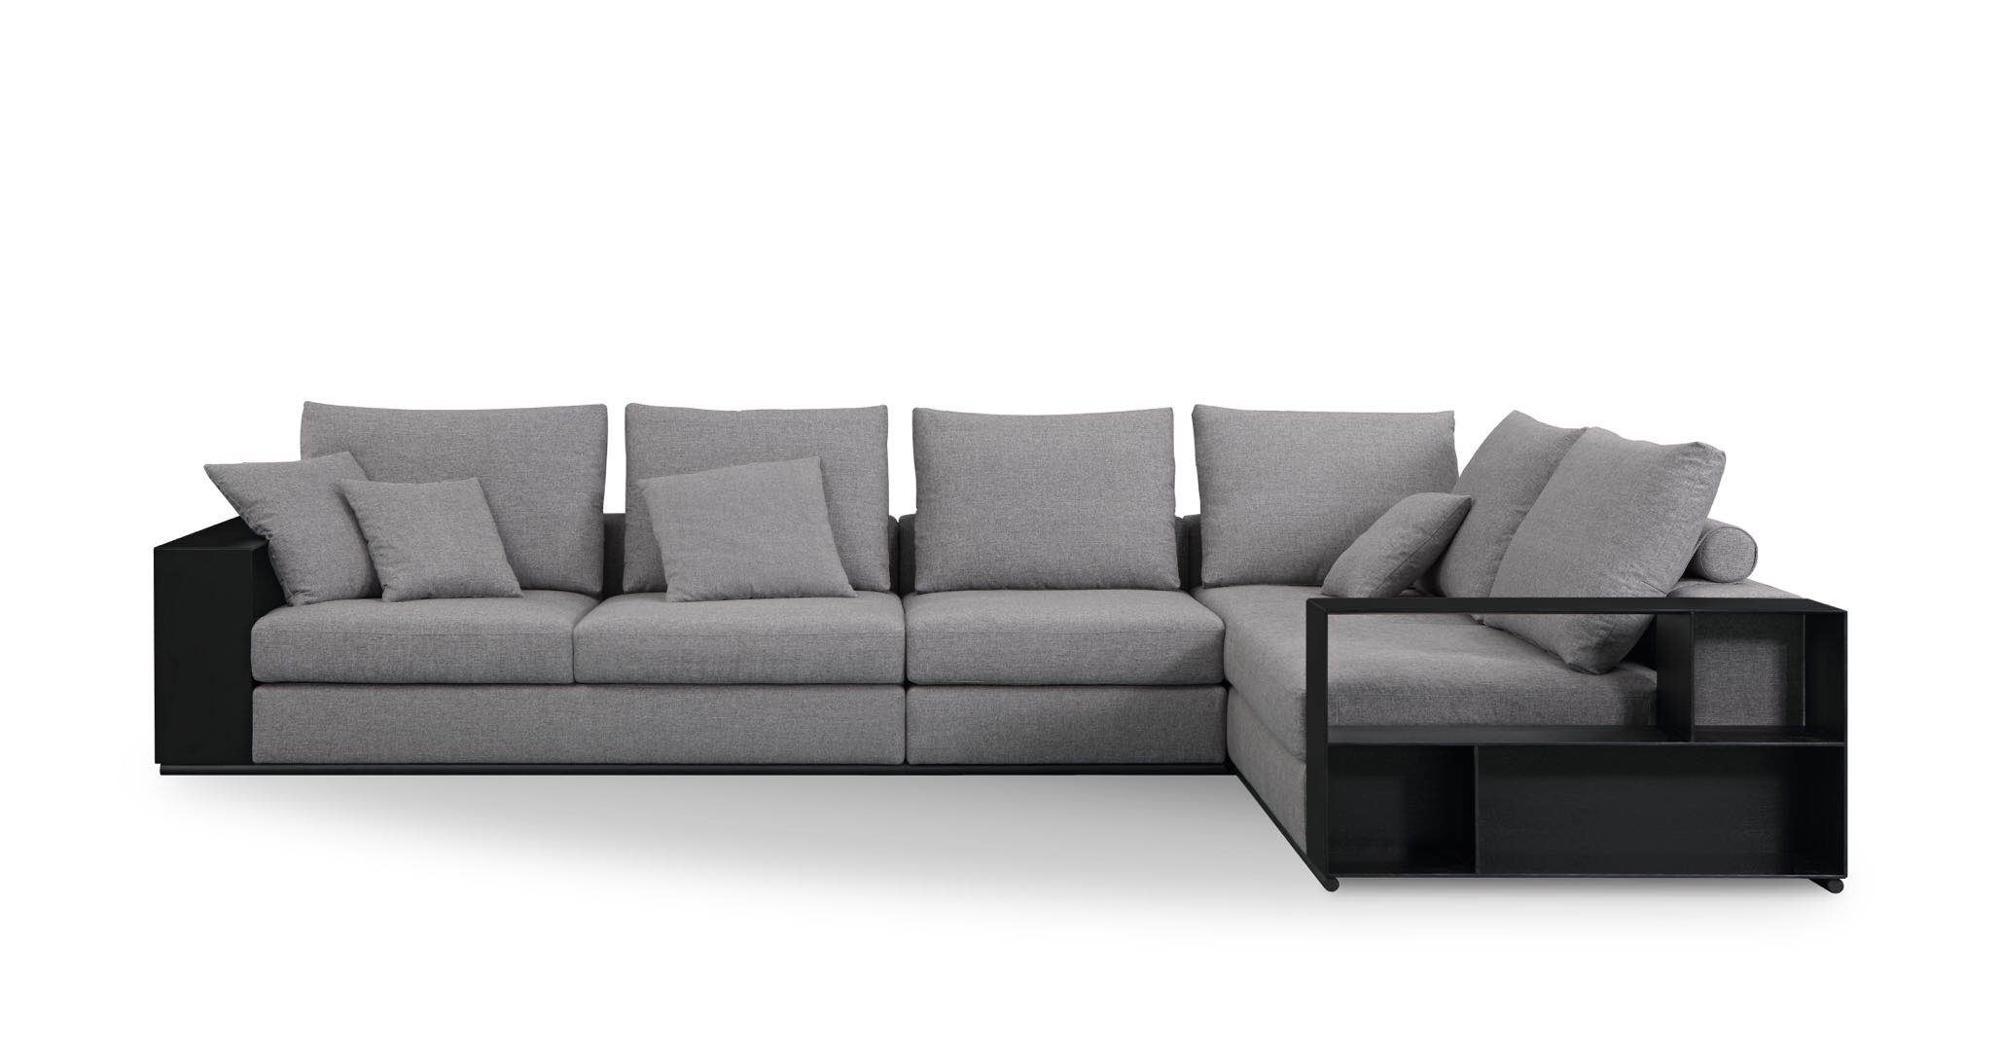 italian corner sofa set new l shaped sofa designs wooden sofa set buy wooden sofa set italian corner sofa set new l shaped sofa designs product on